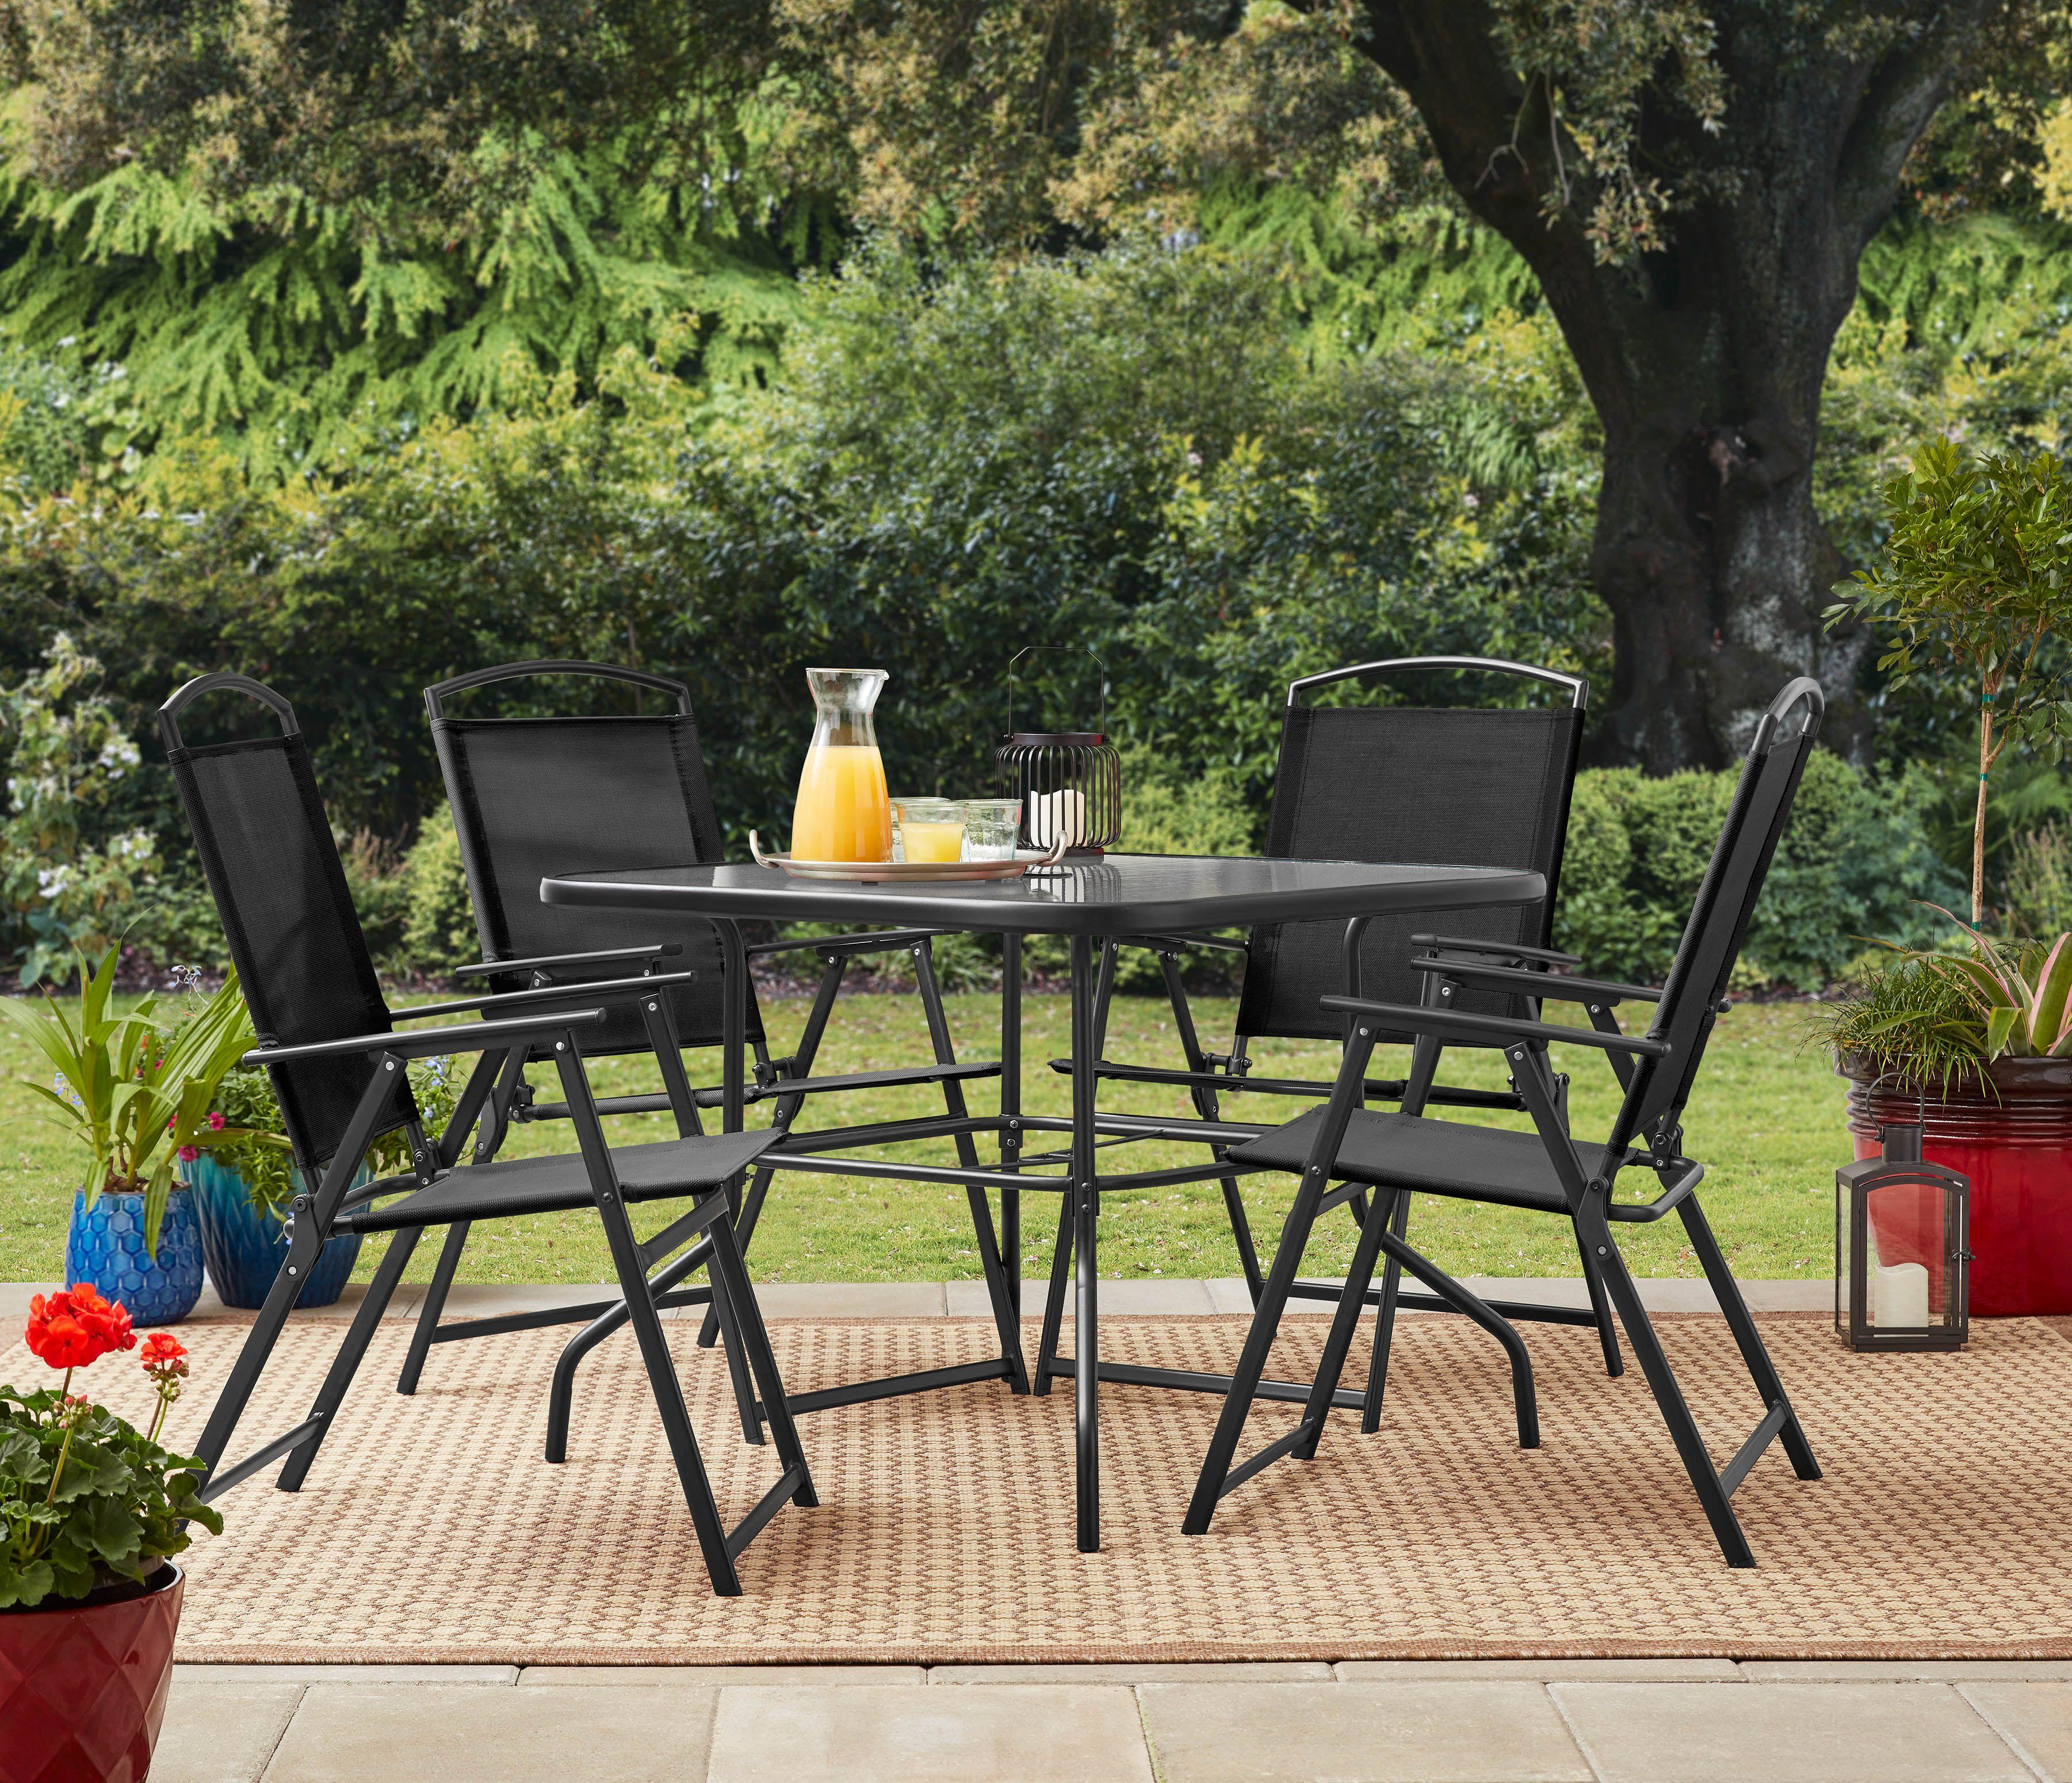 Mainstays Heritage Park Outdoor Patio 5 Piece Dining Set